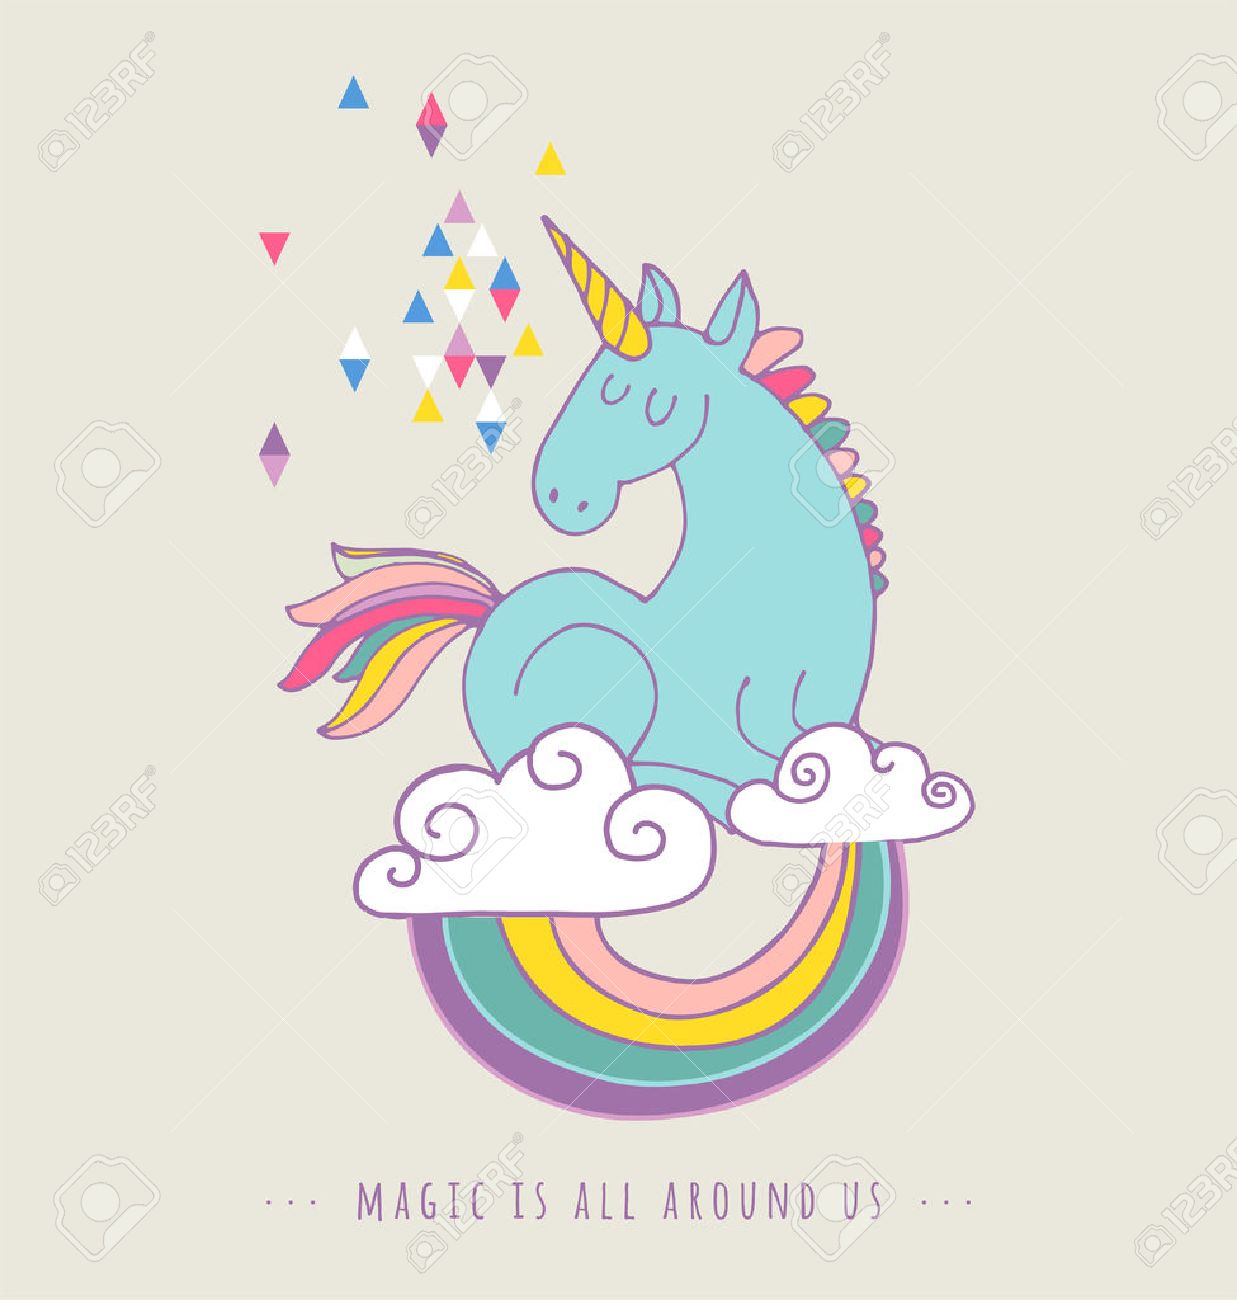 51065560-cute-magic-unicon-and-rainbow-p